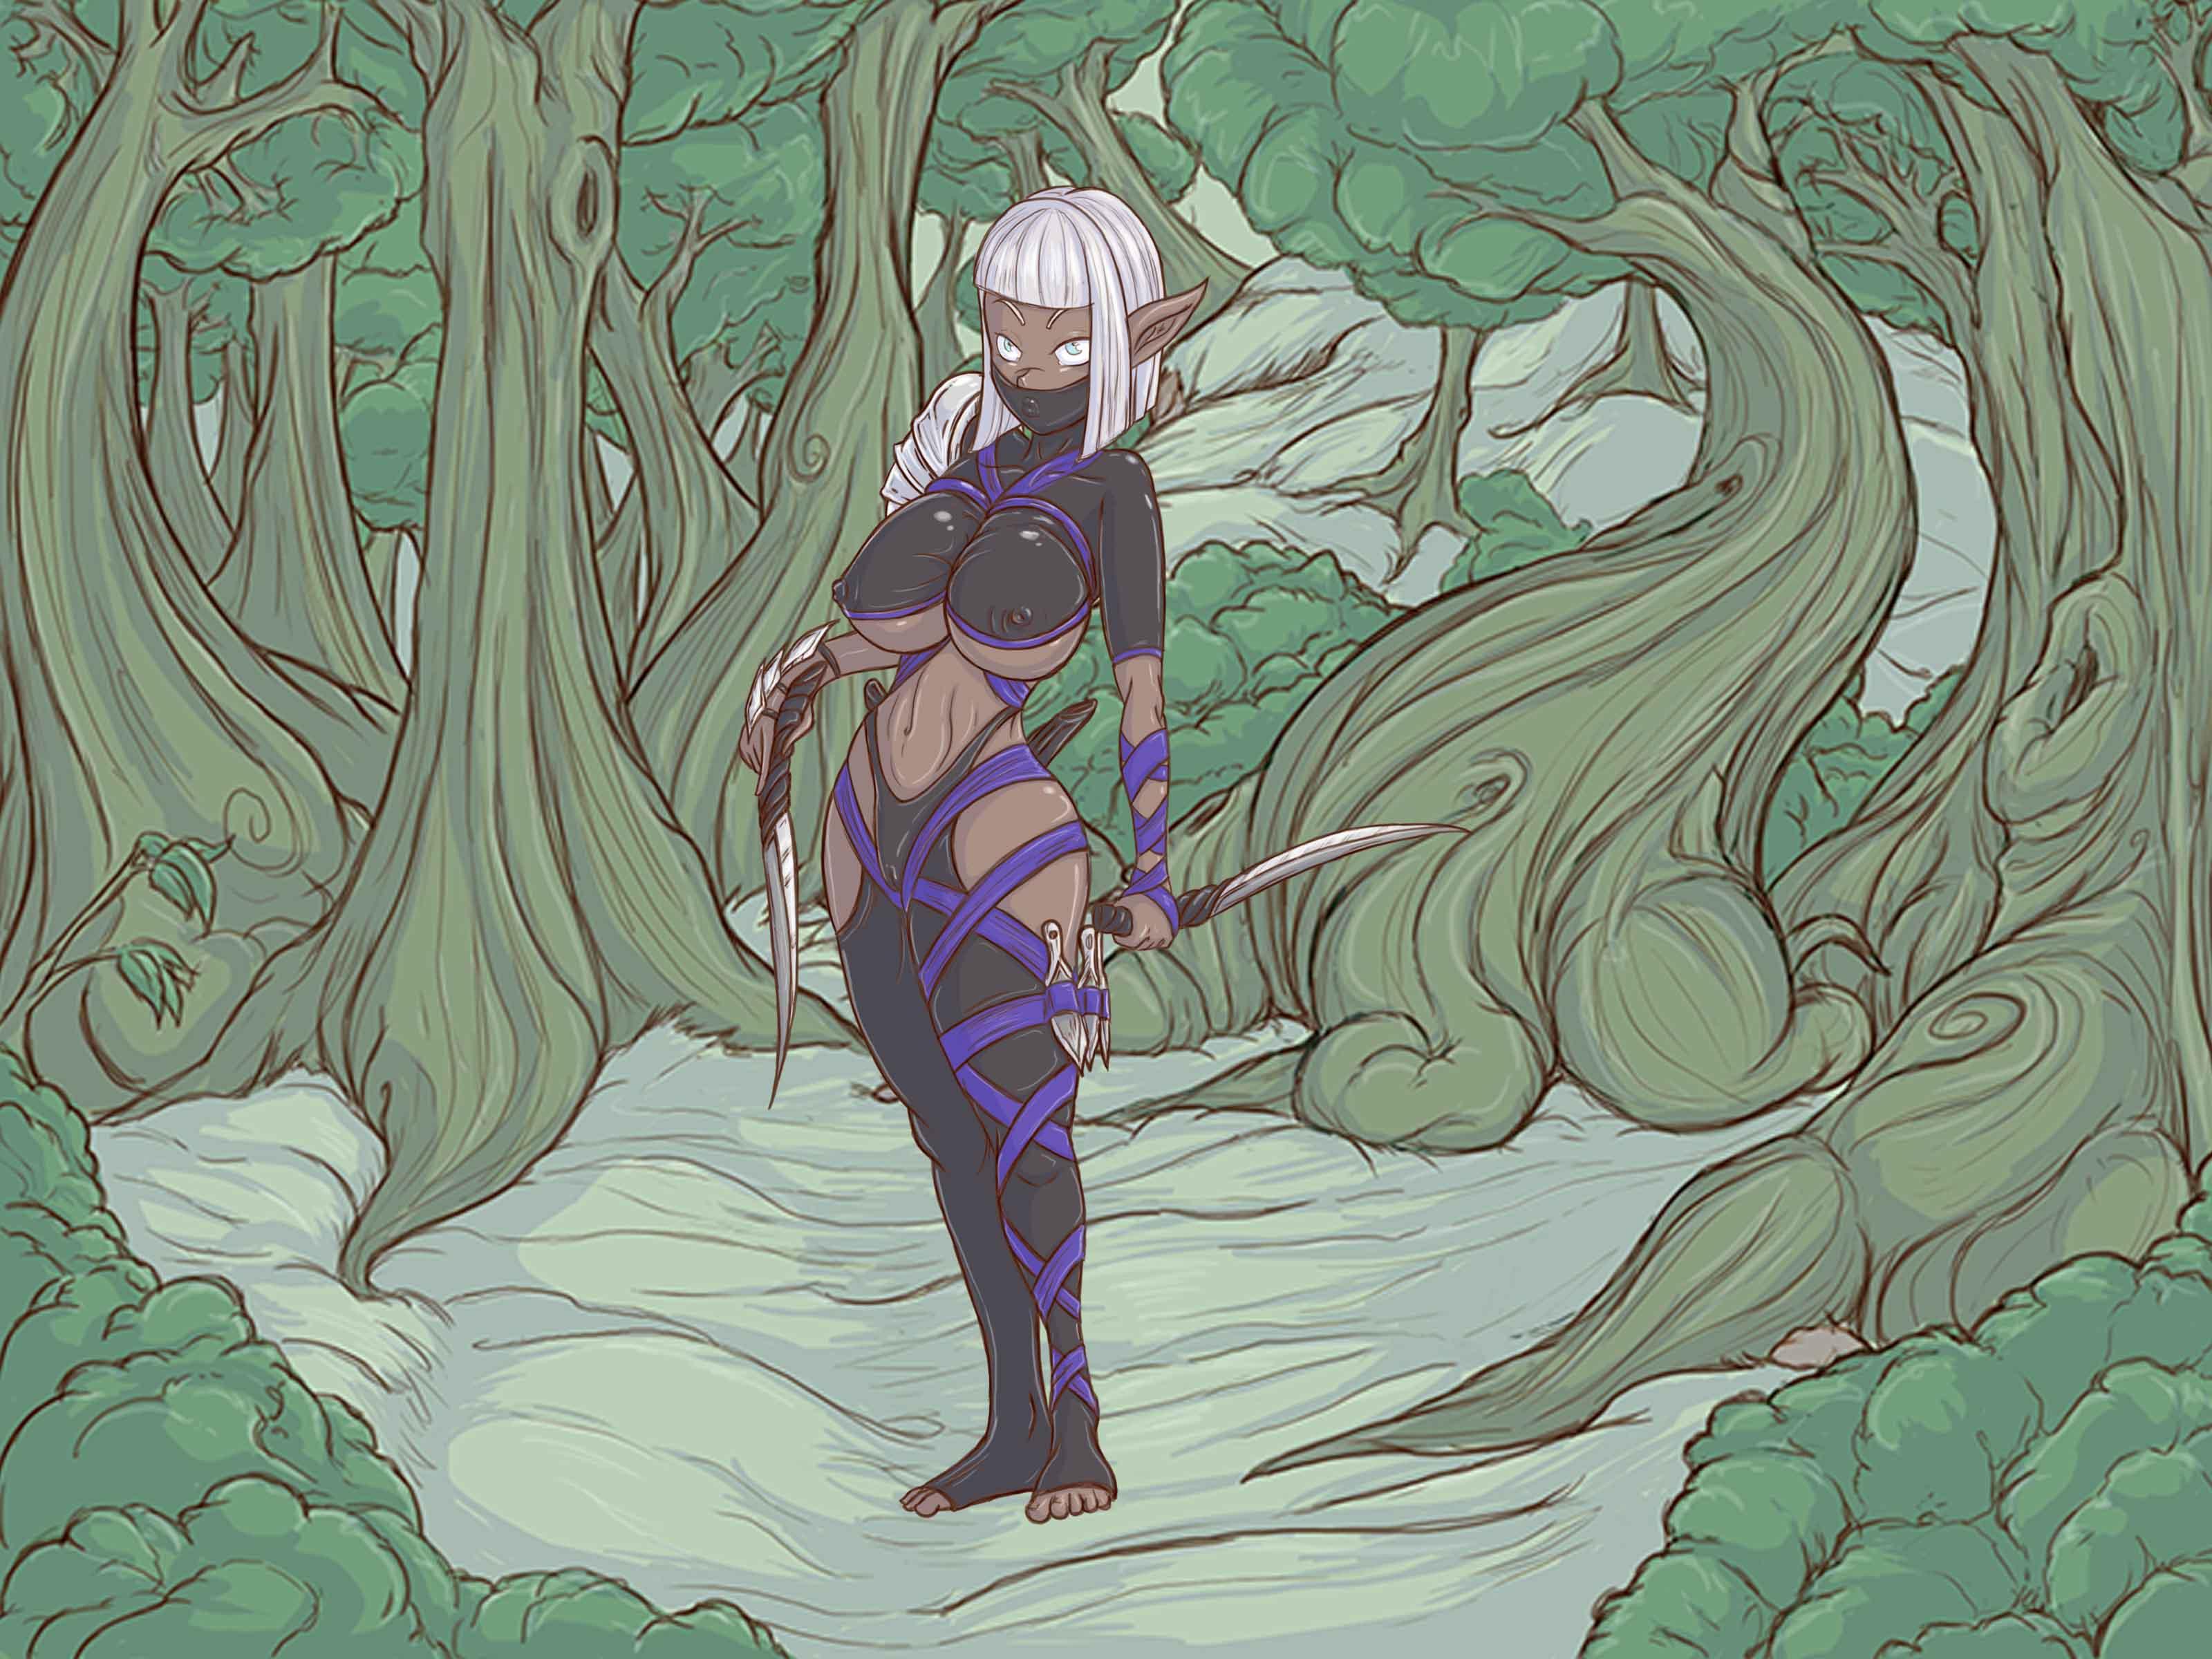 Kaeryn assassin from the mountain elfs (Sponsored by Vince77)